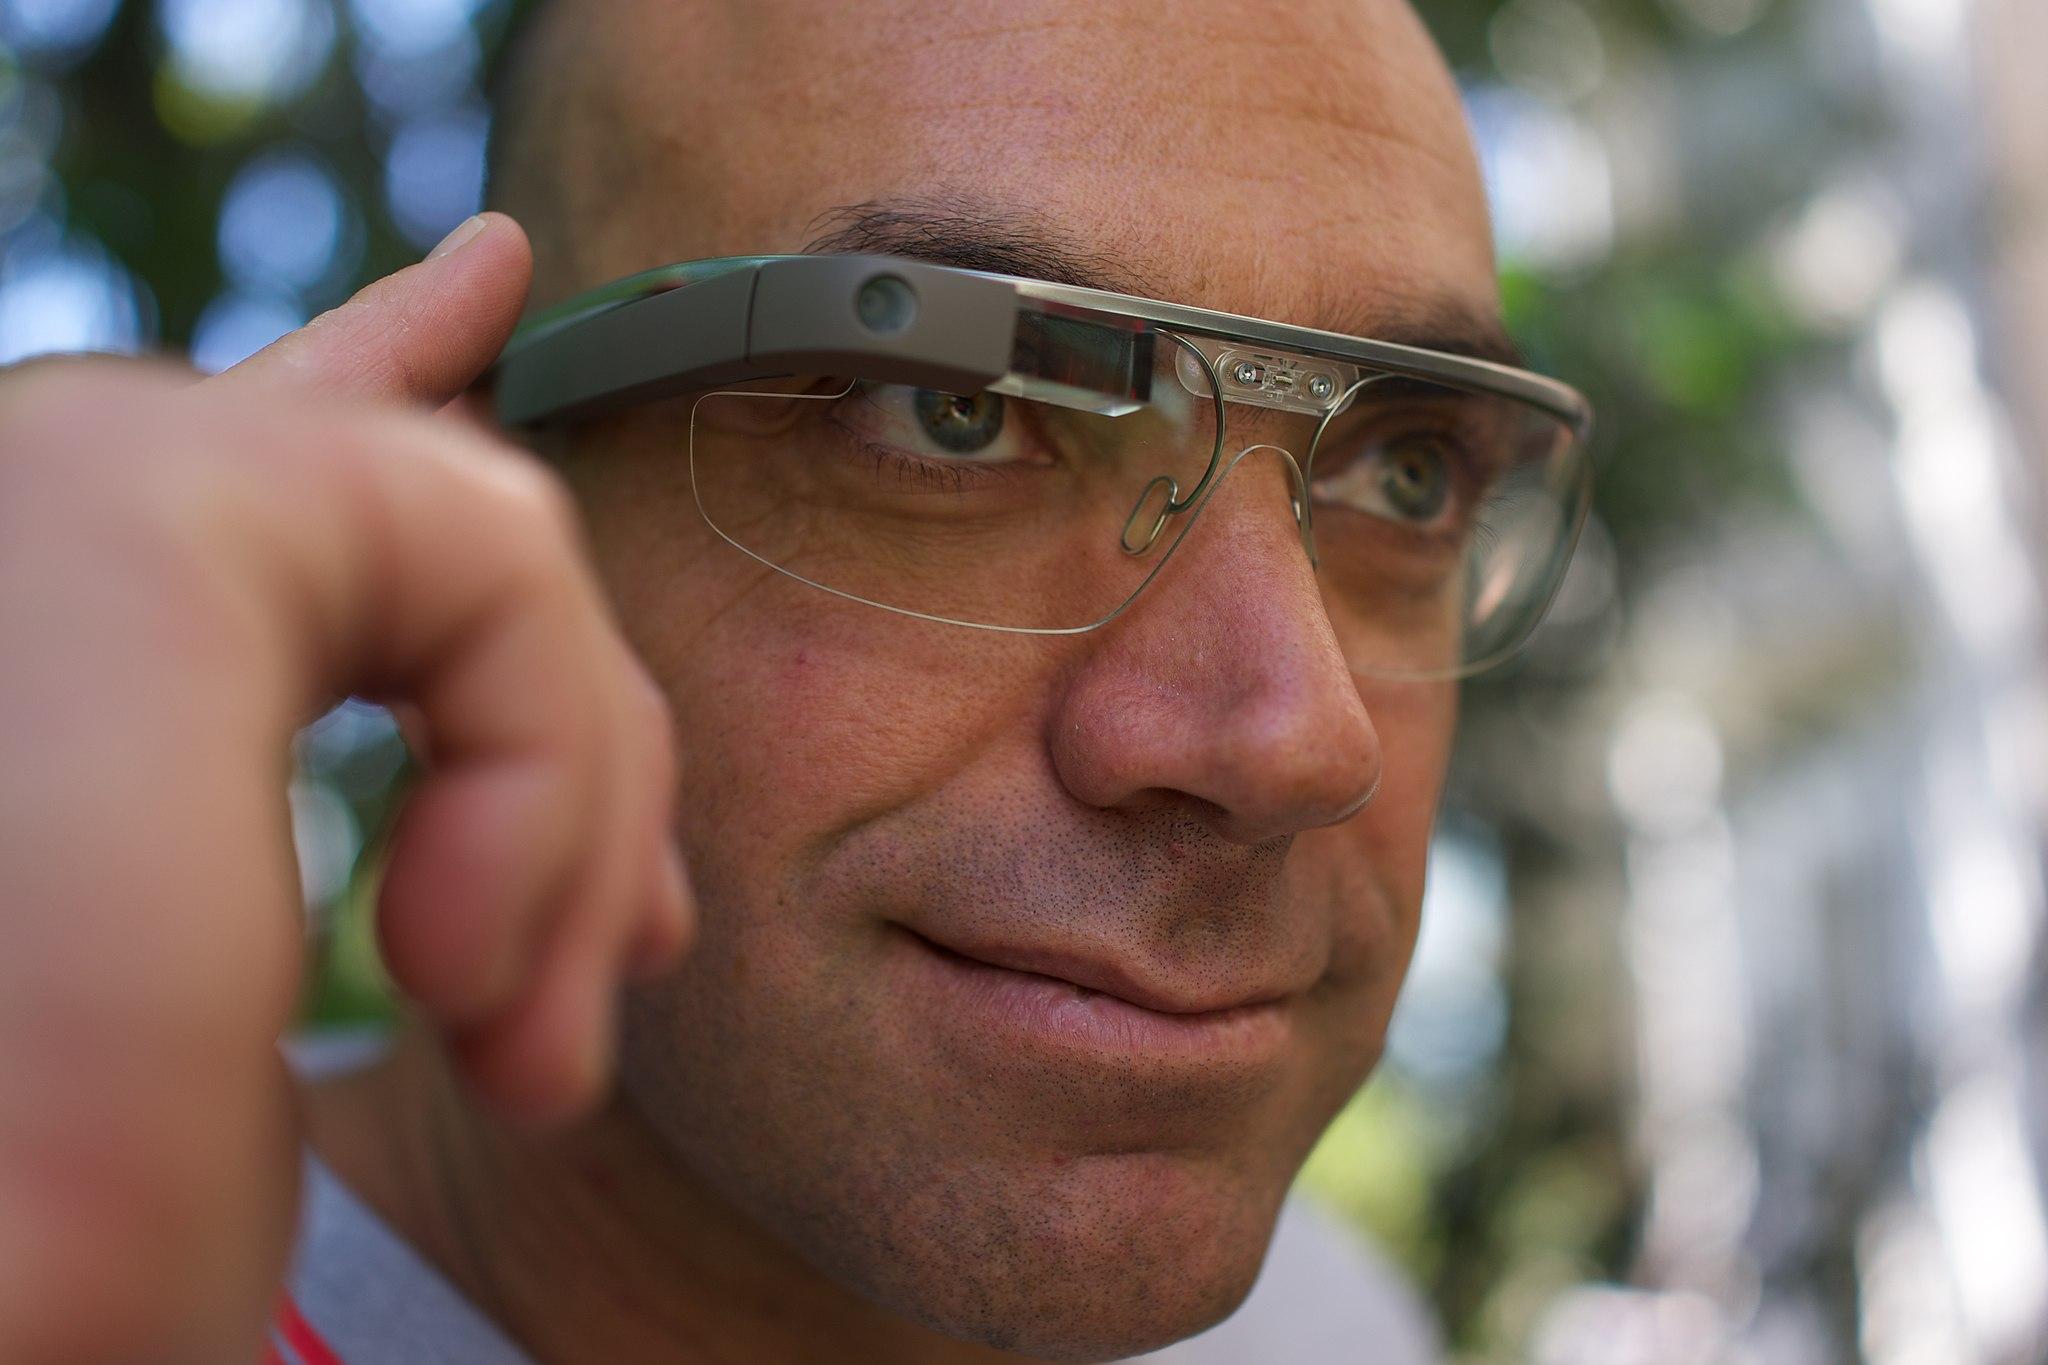 A Google Glass wearer